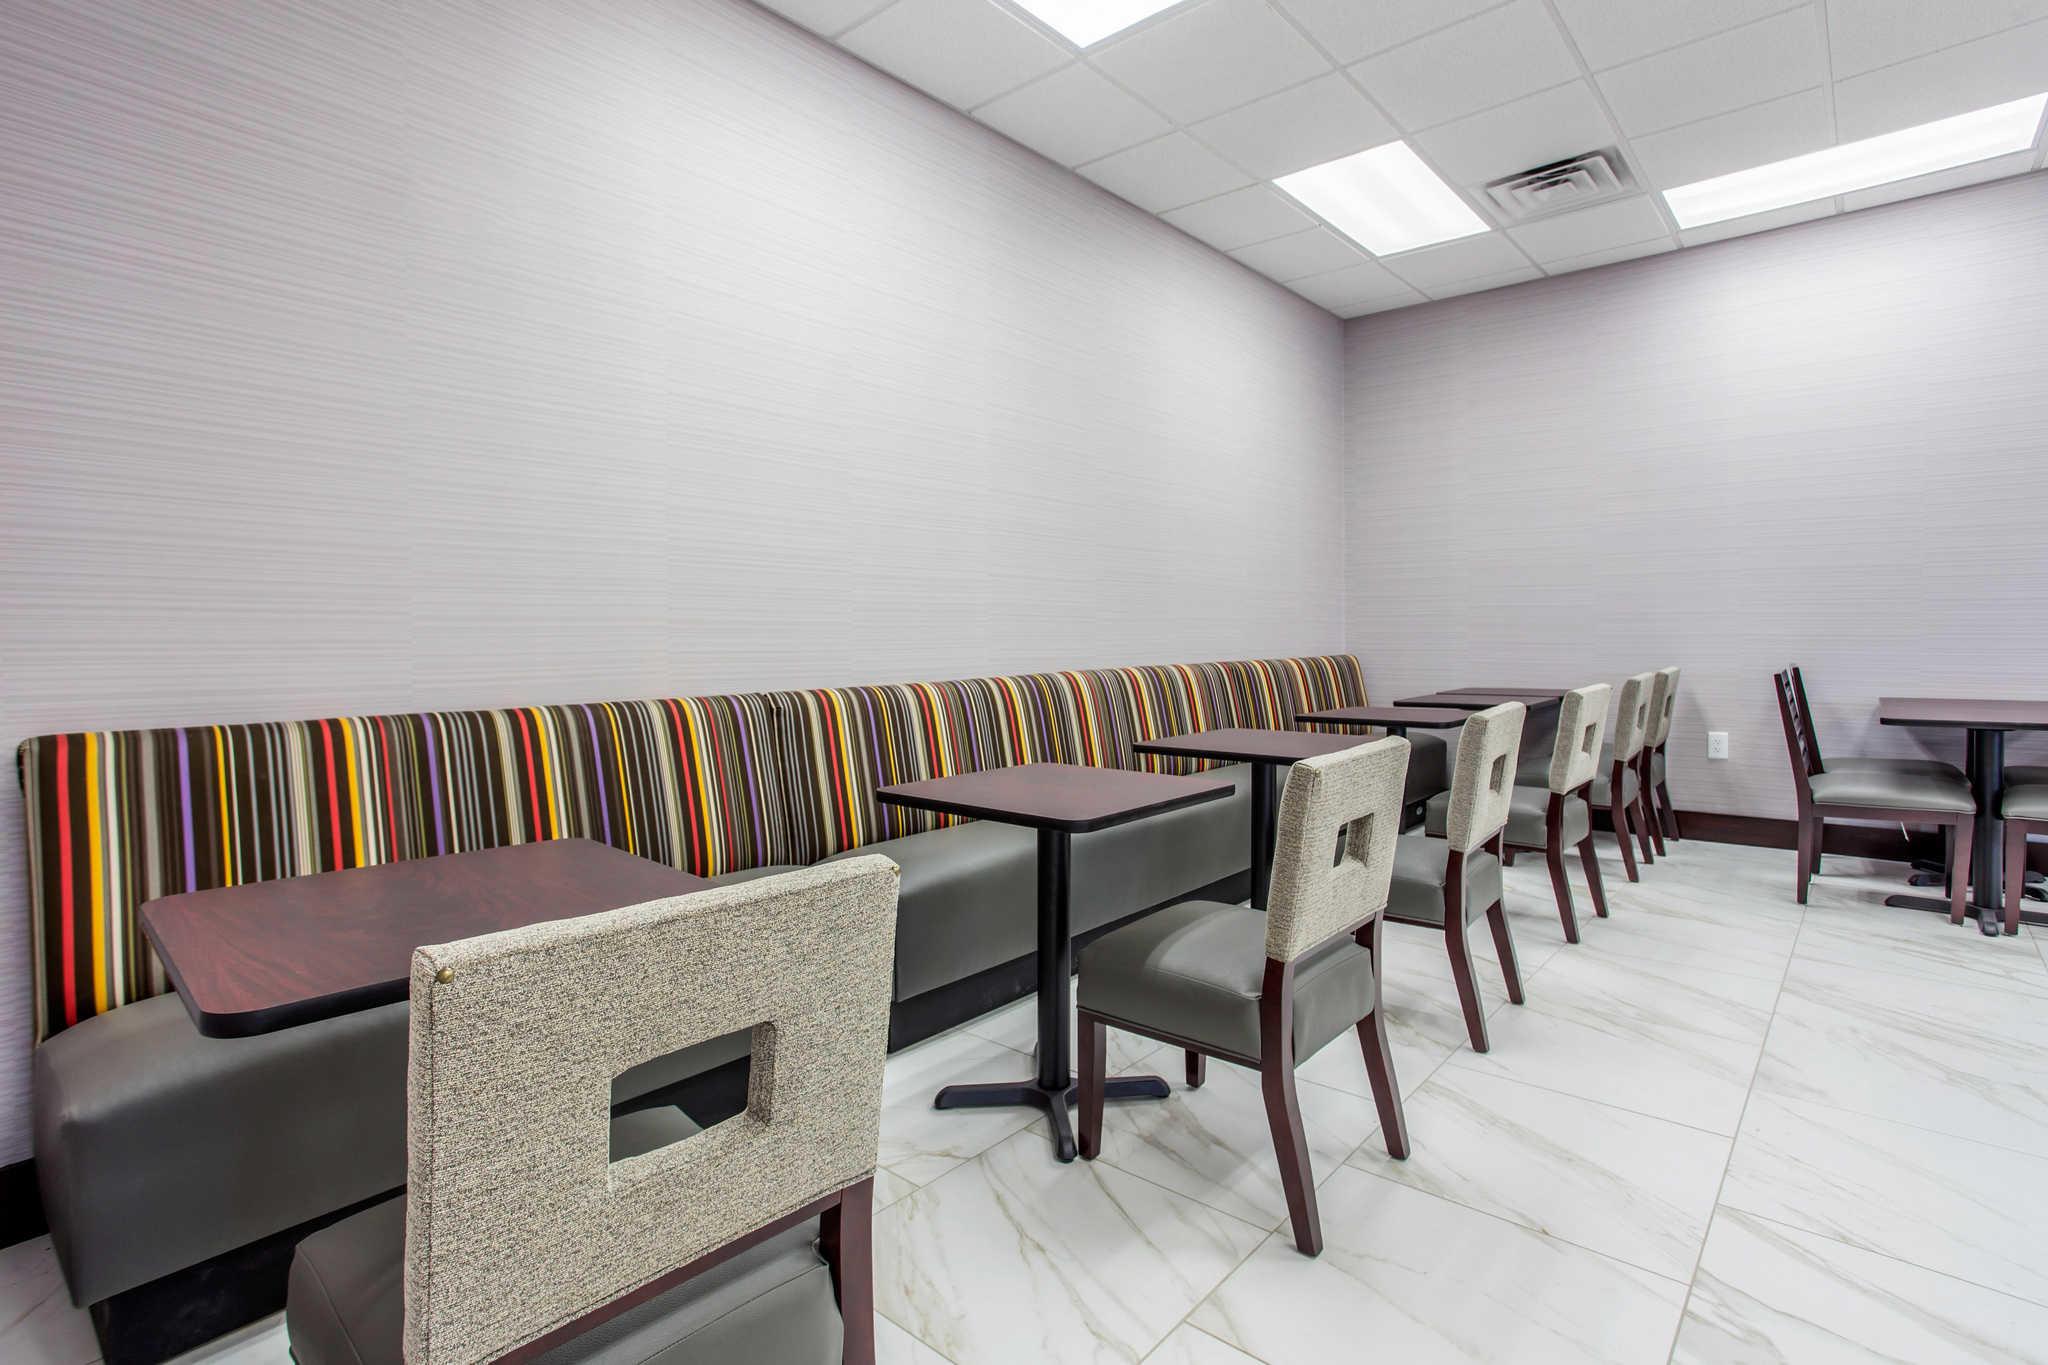 Clarion Inn & Suites image 26